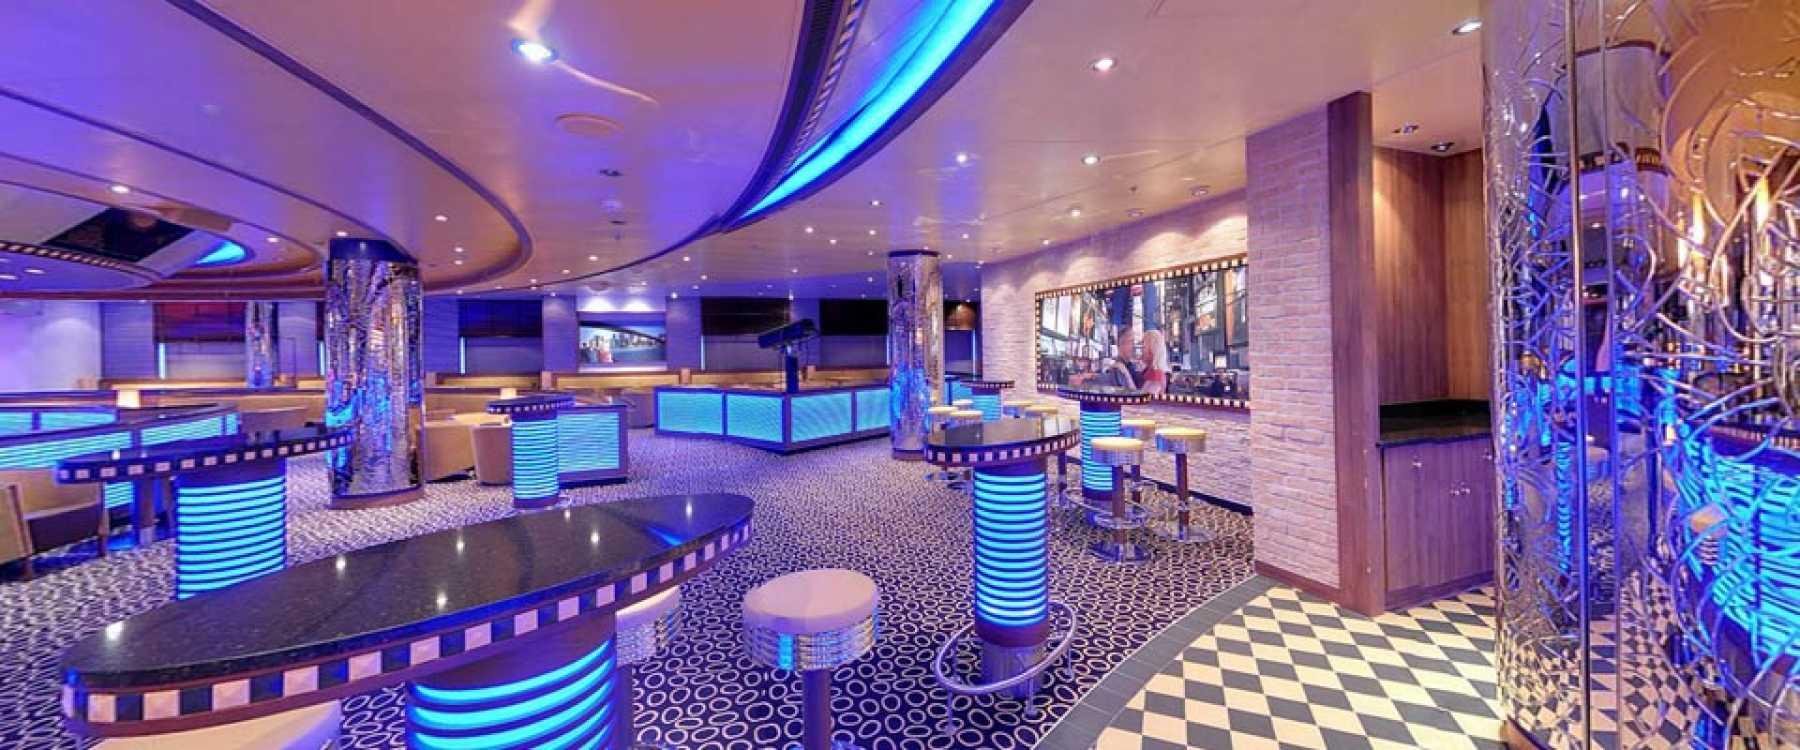 P&O Cruises Azura Interior Manhattan1 .jpg